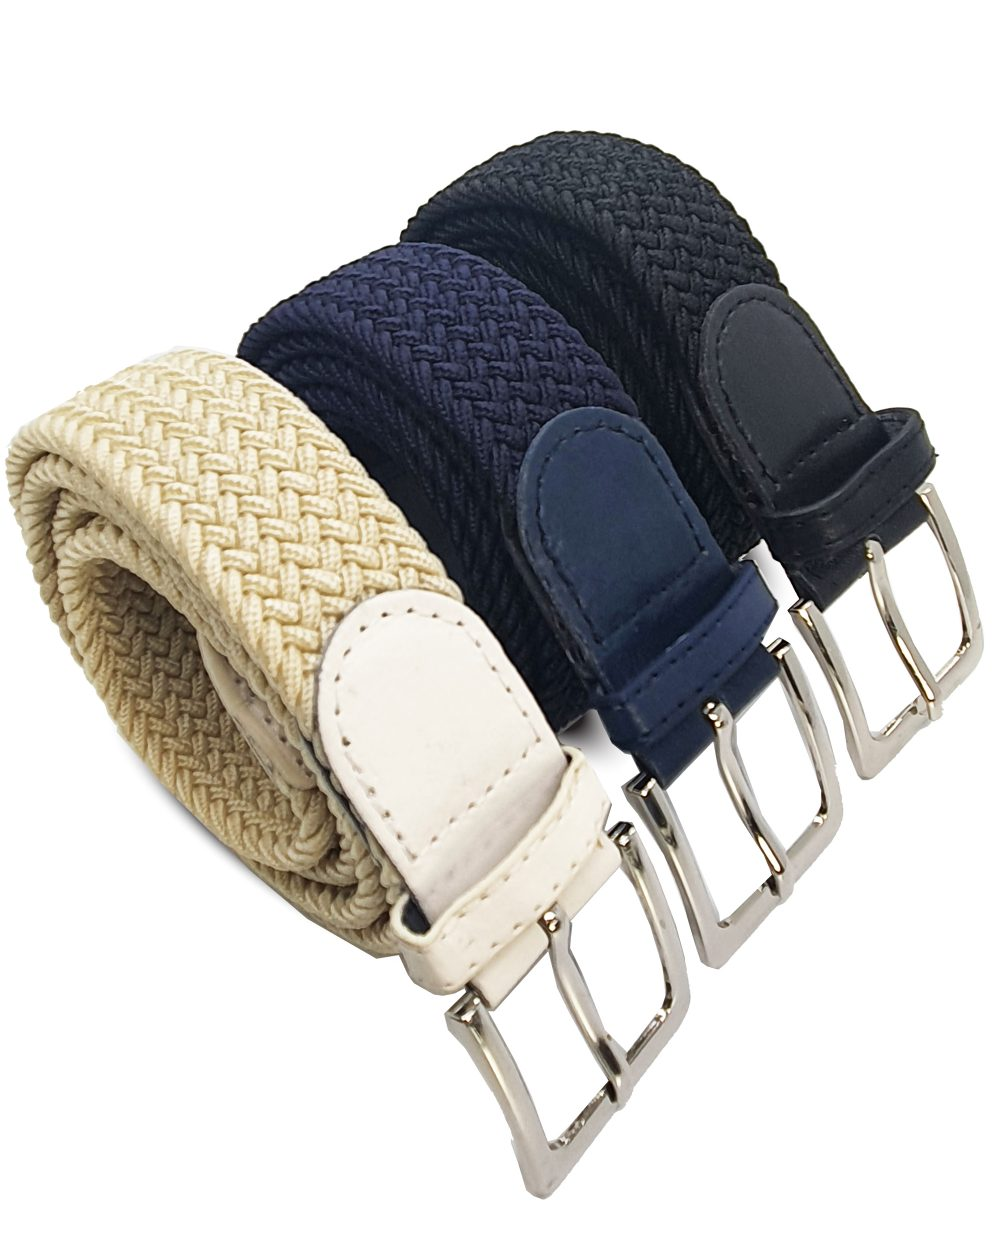 elastiek-stof30mm-zwart-beige-blauw-3pak